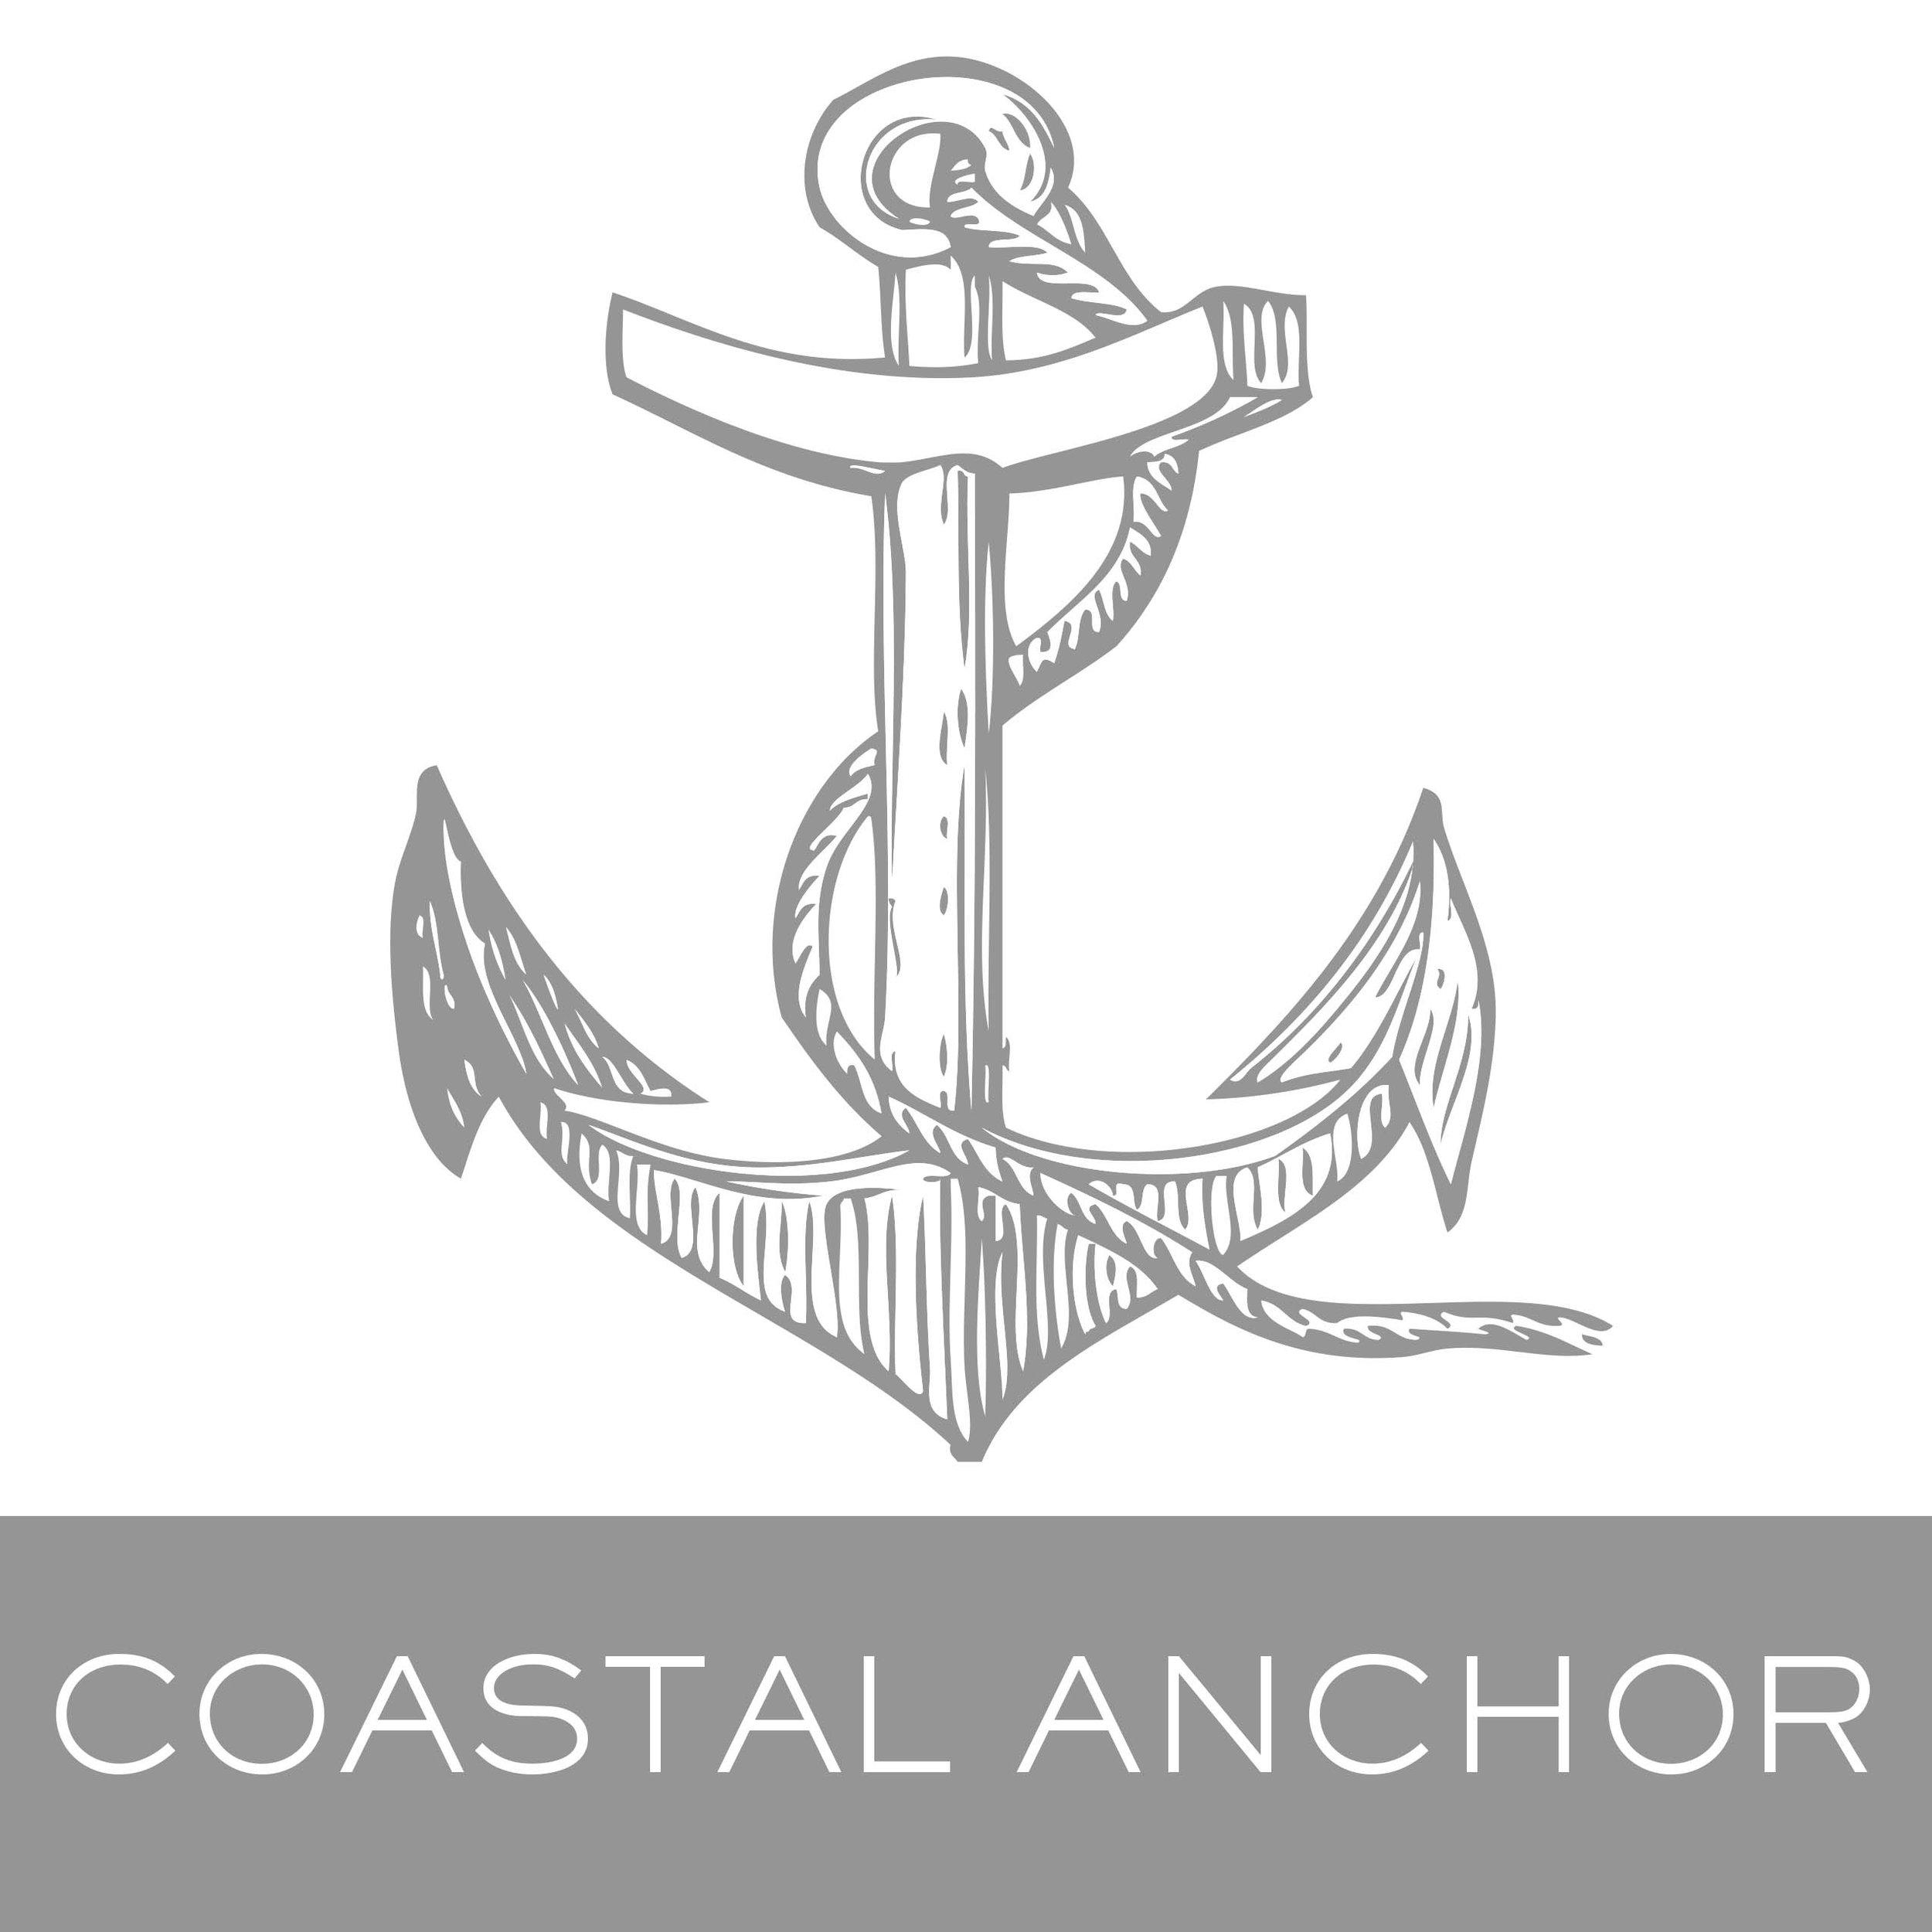 coastalanchor.jpg